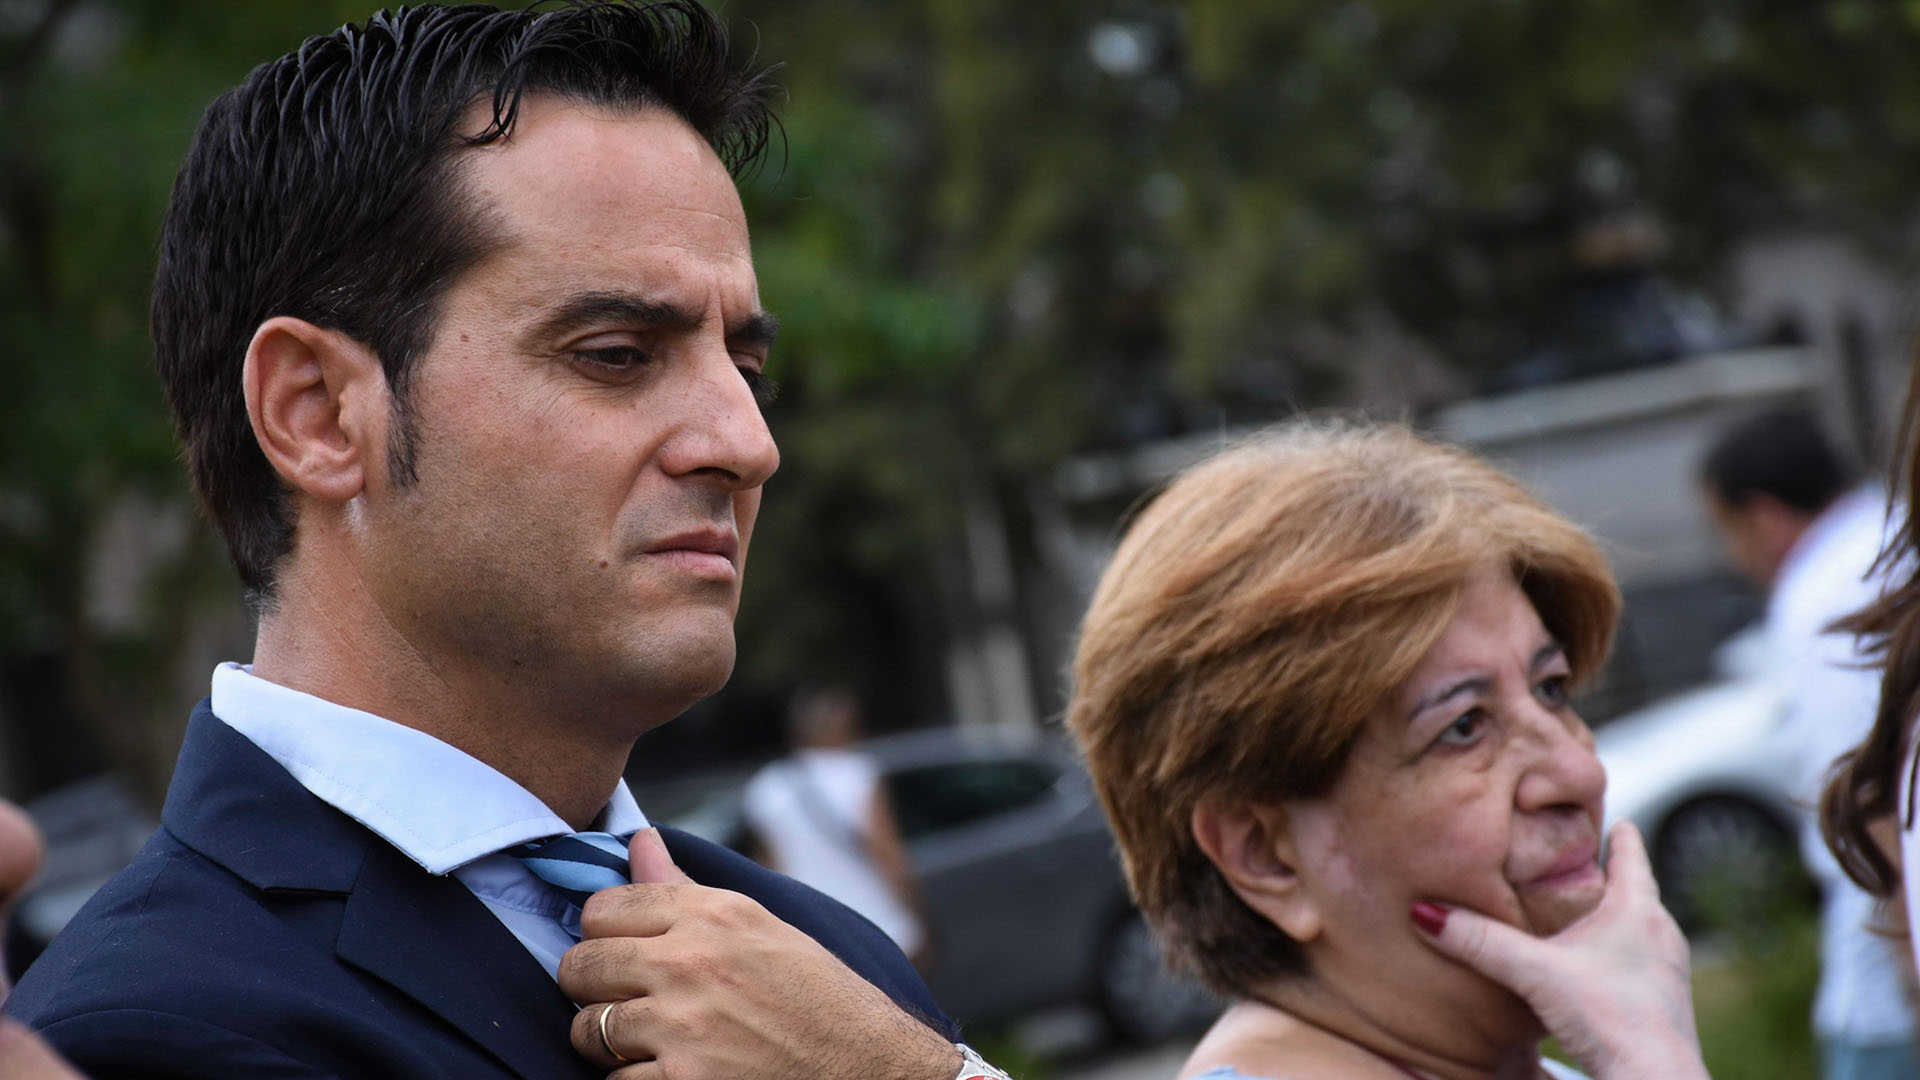 El periodista Ignacio González Prieto